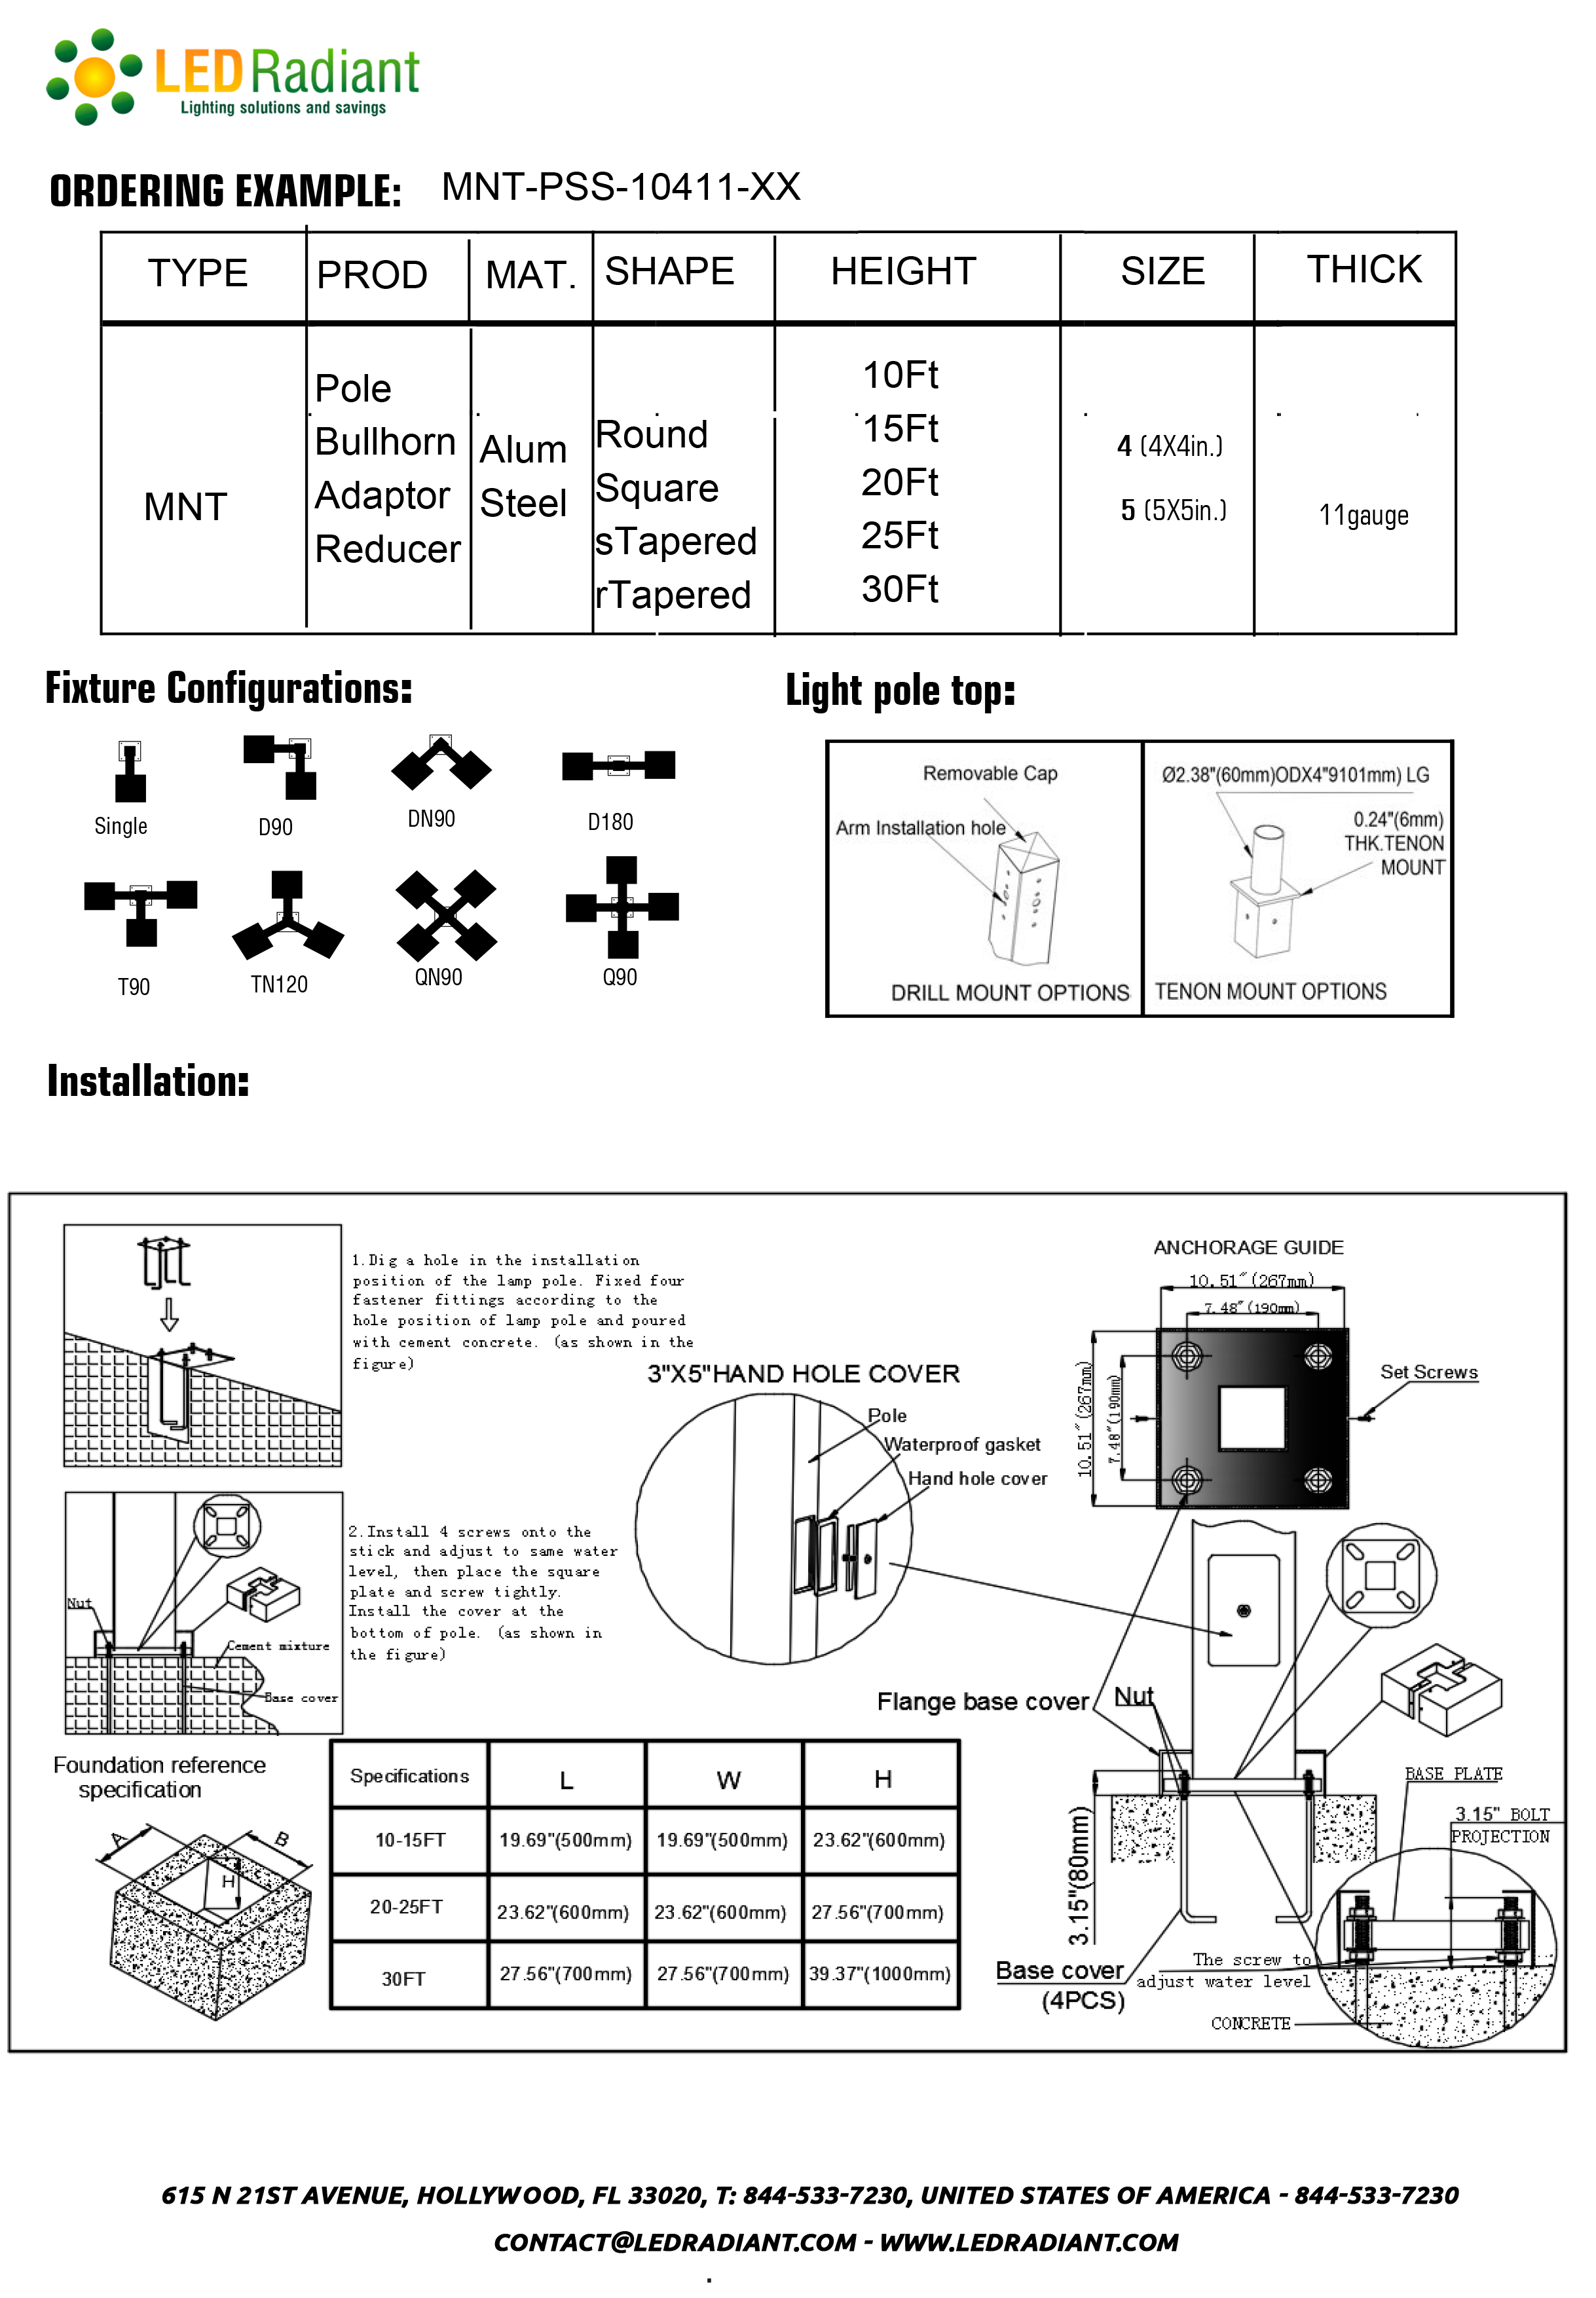 10Ft steel straight square steel pole drawings